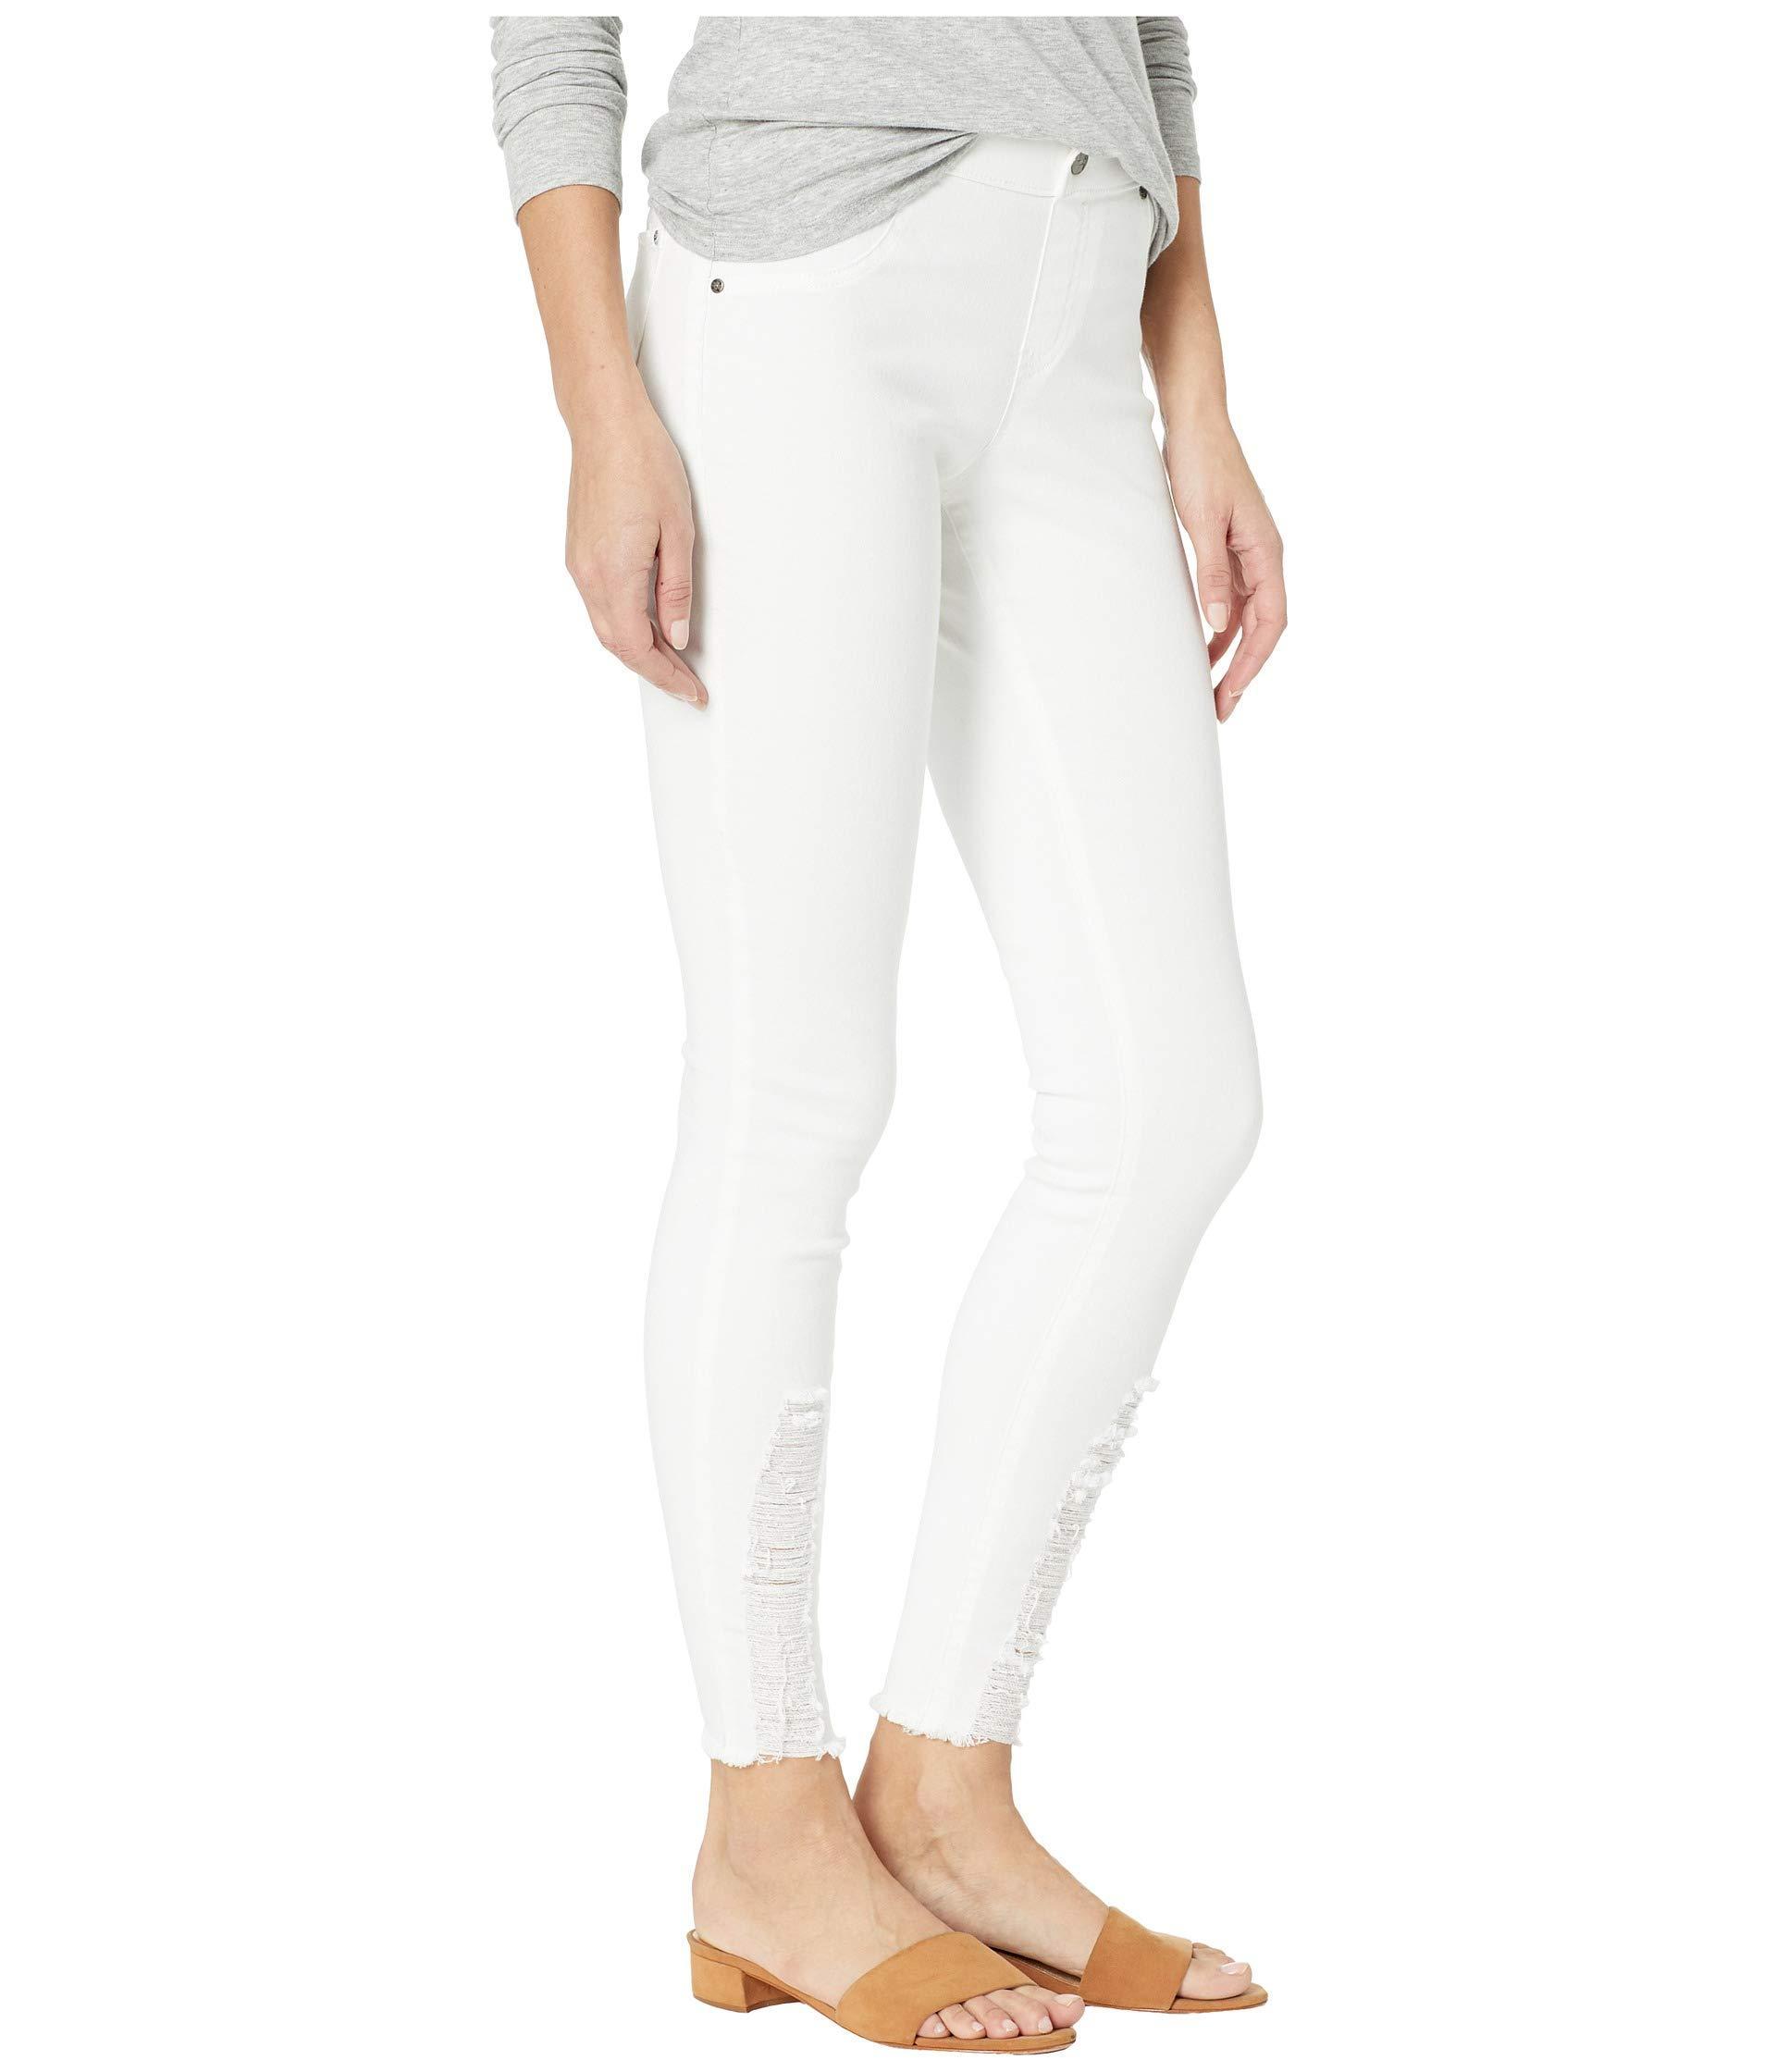 HUE Ankle Slit Crop Denim Leggings White NWT $40